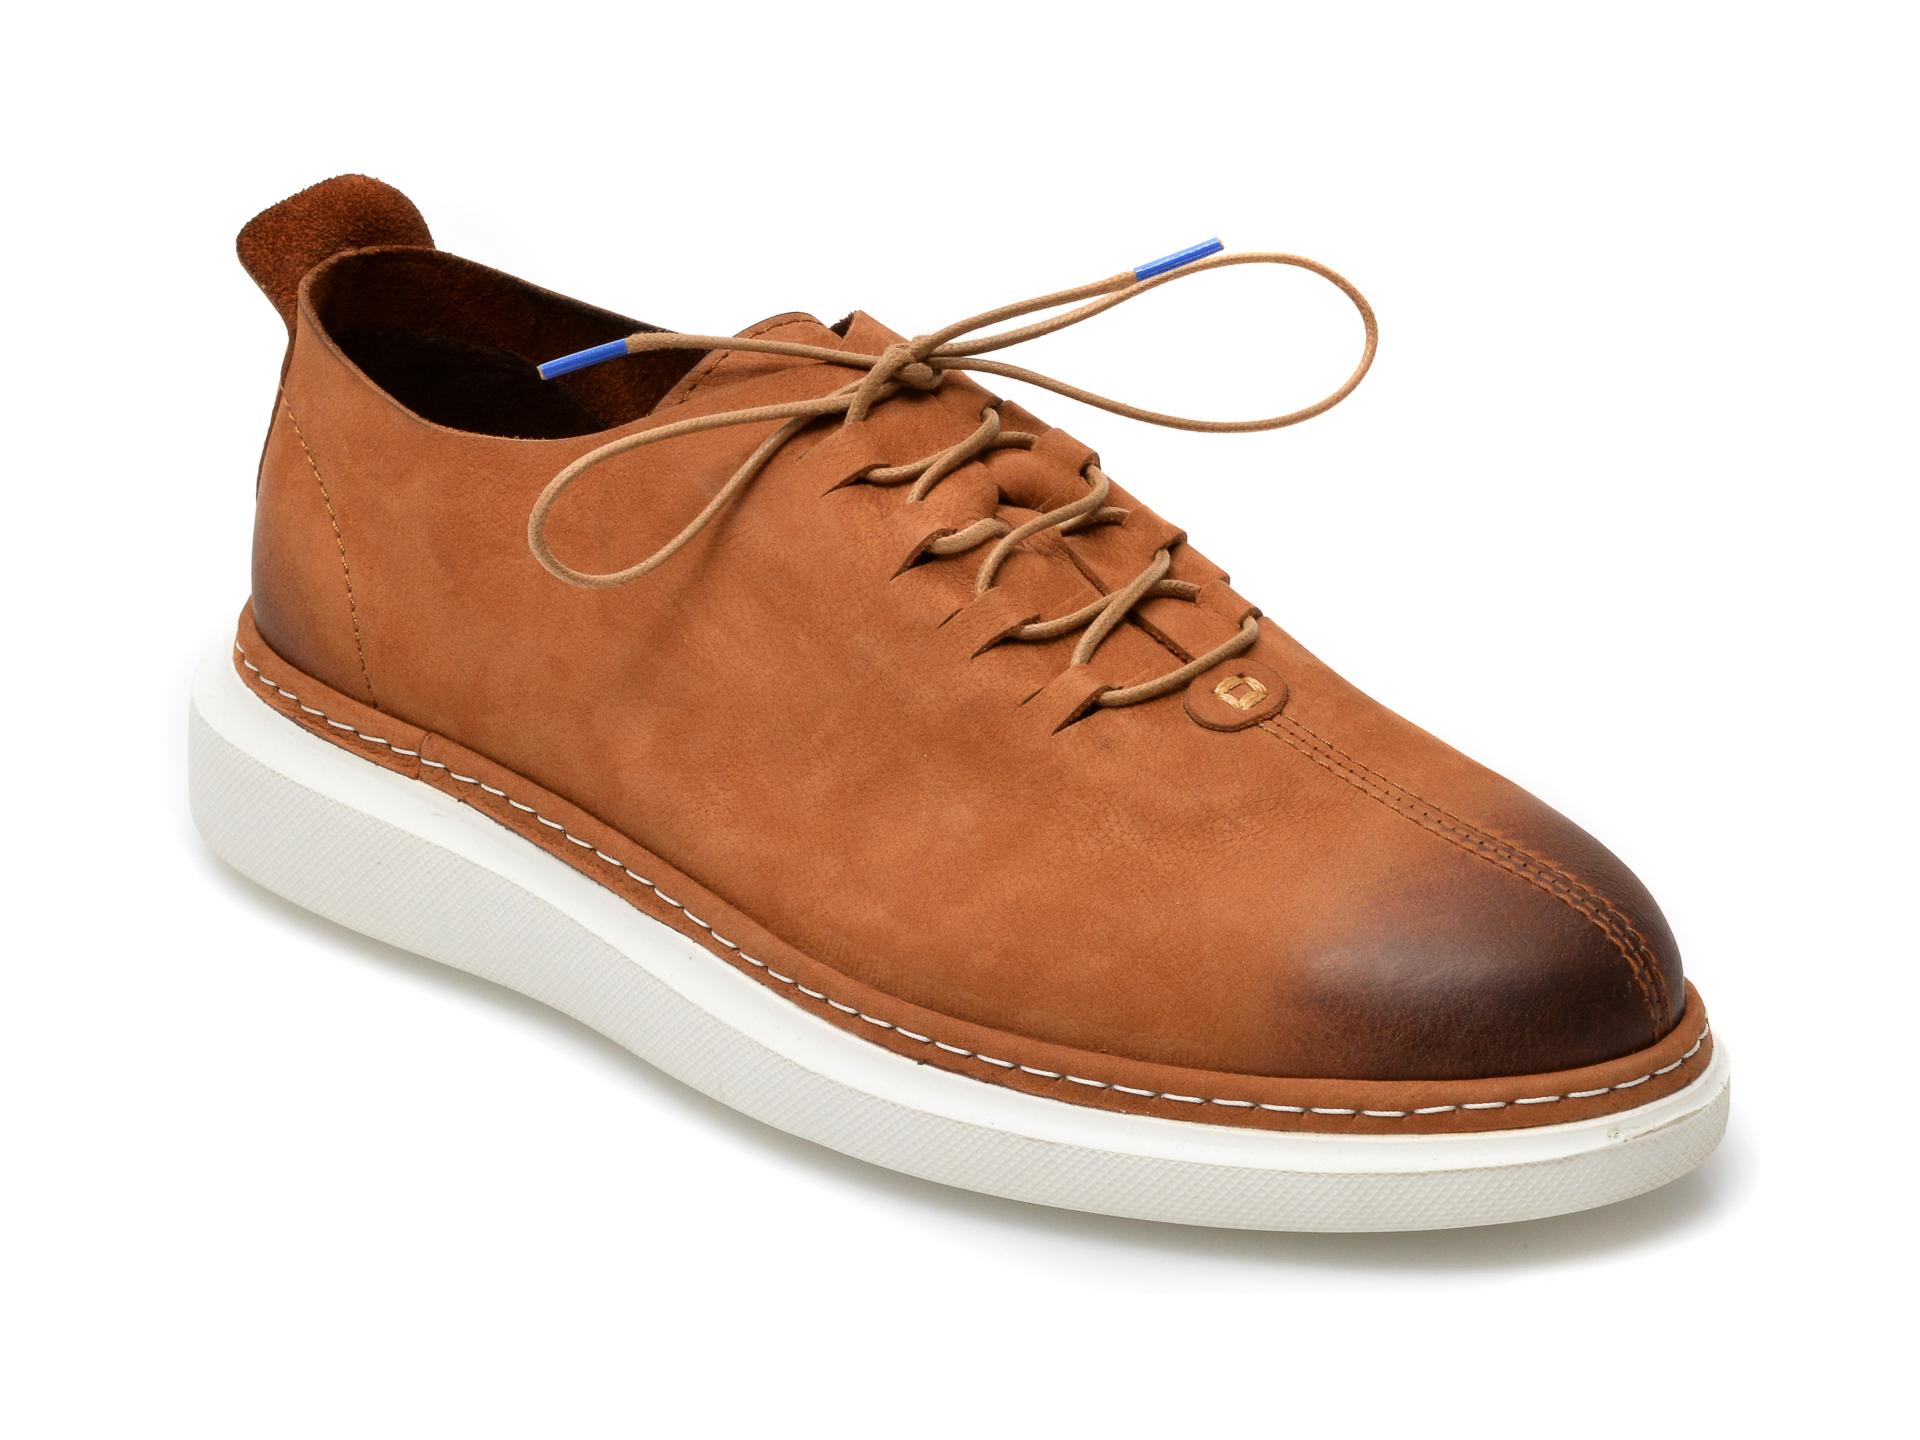 Pantofi OTTER maro, 21KL801, din nabuc